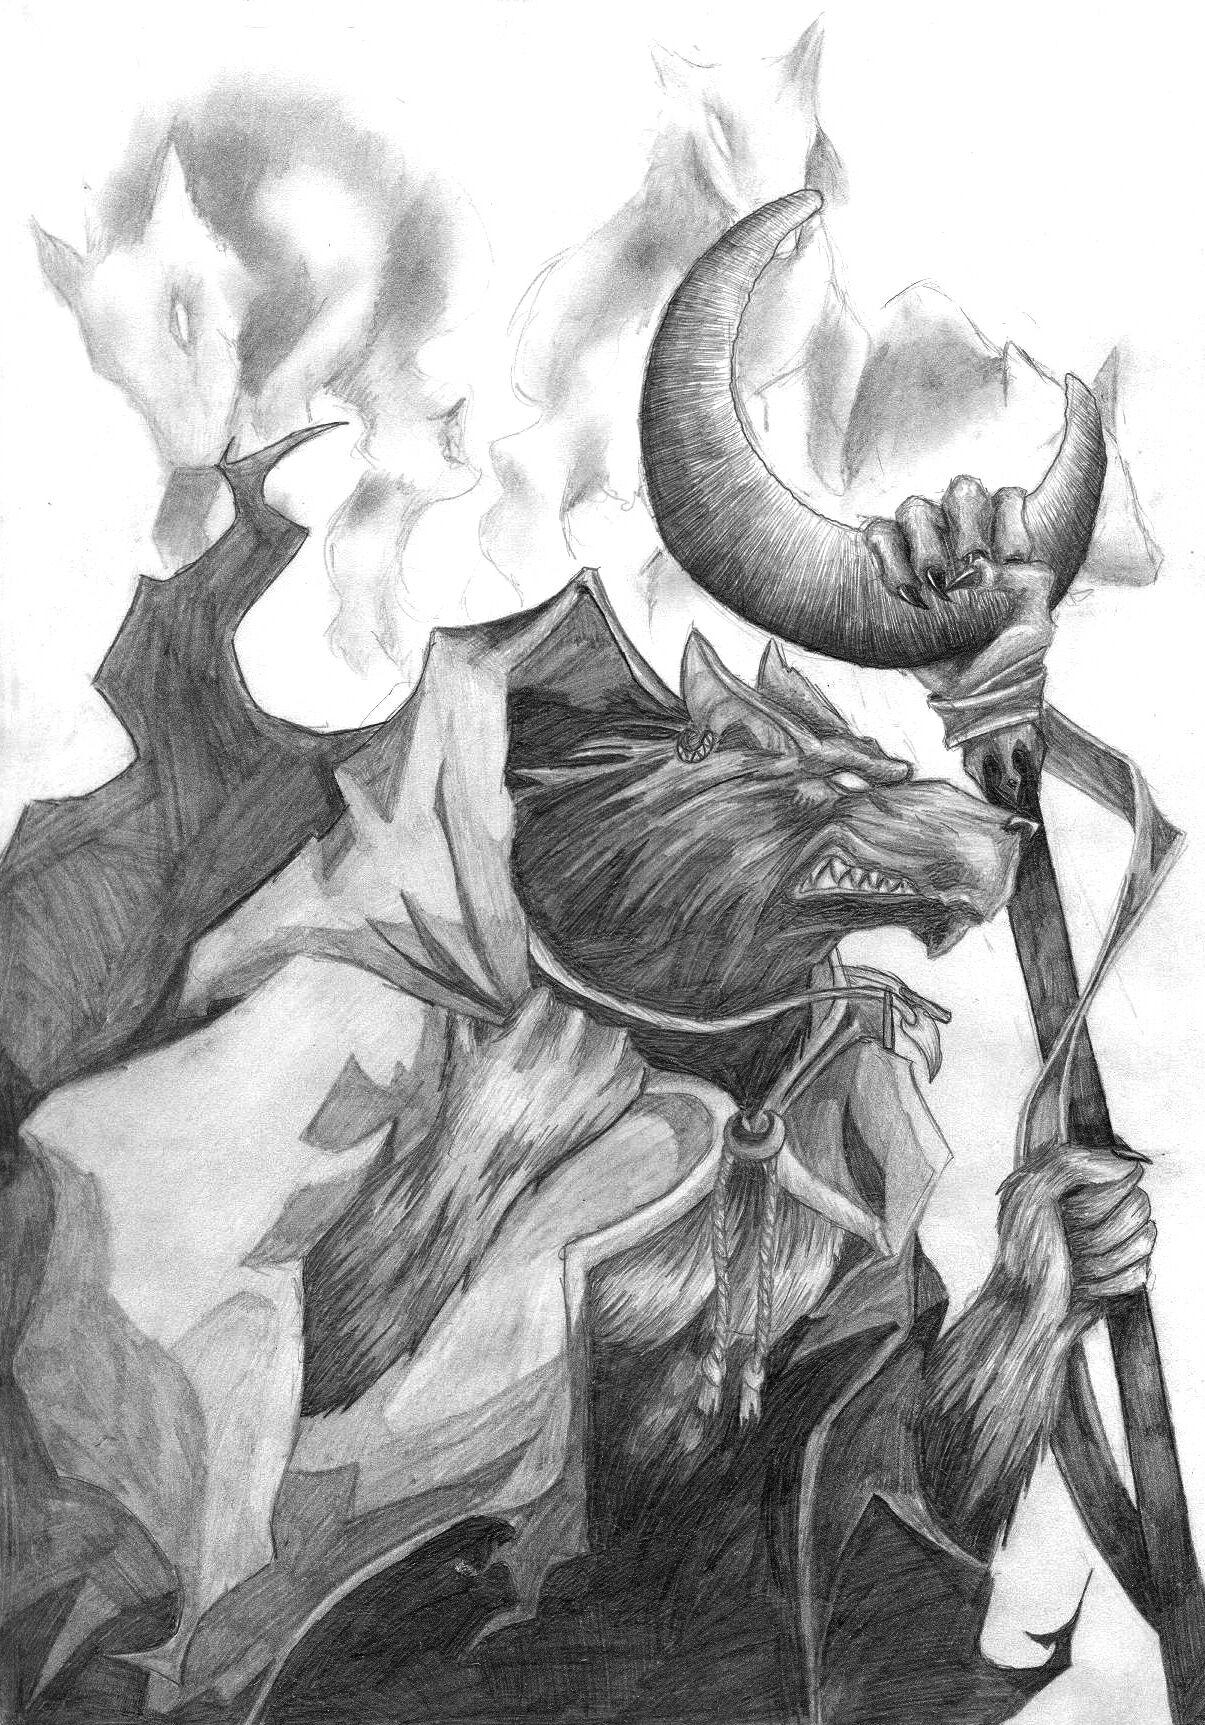 Wilkołak - Nalavara